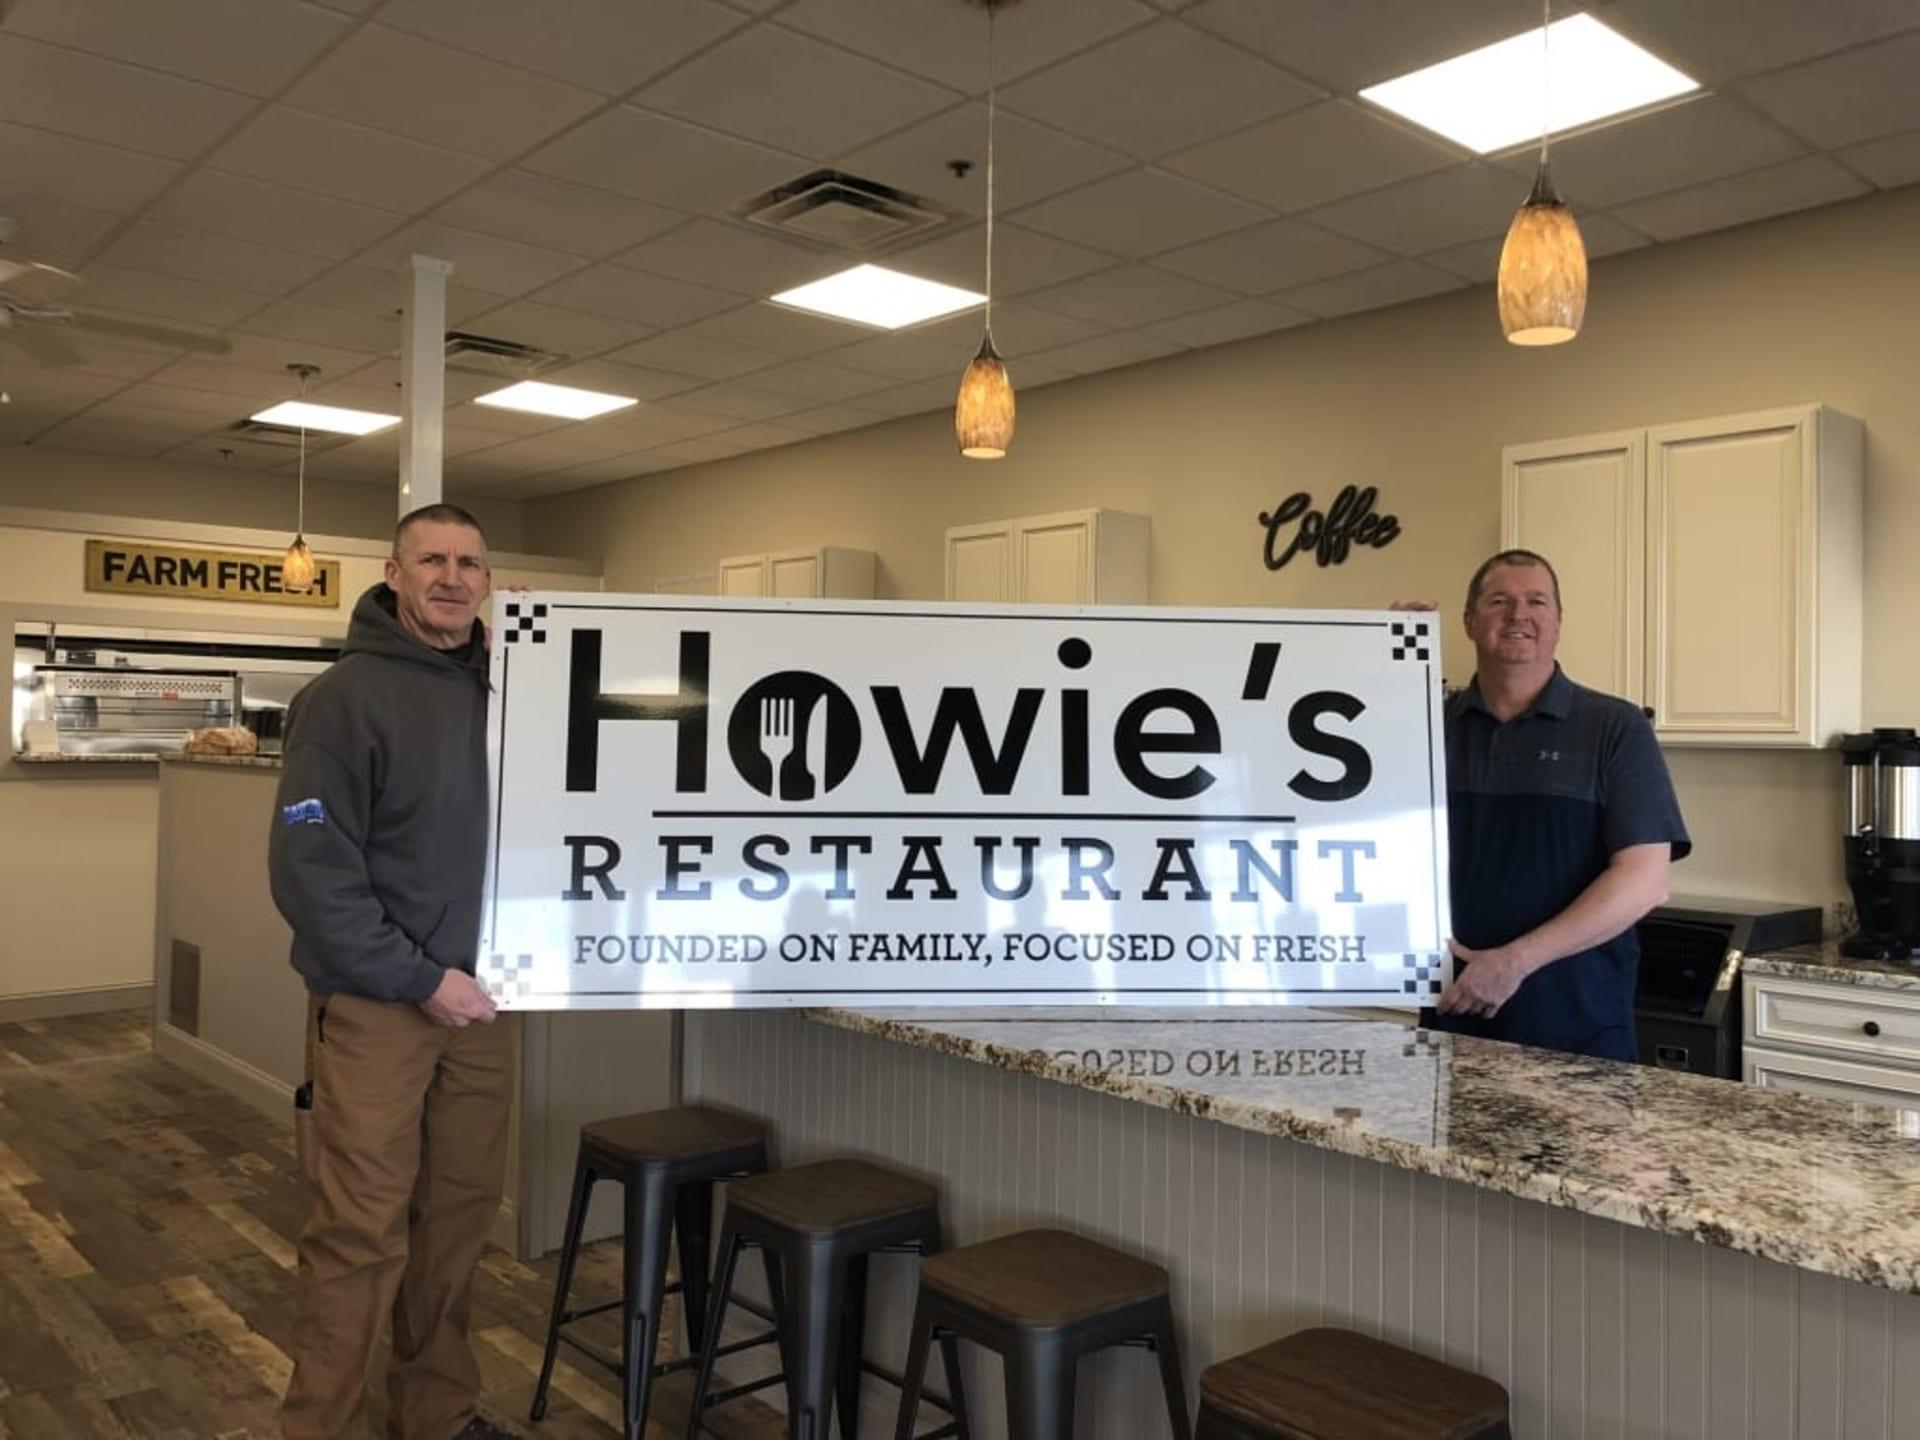 howie's restaurant sign